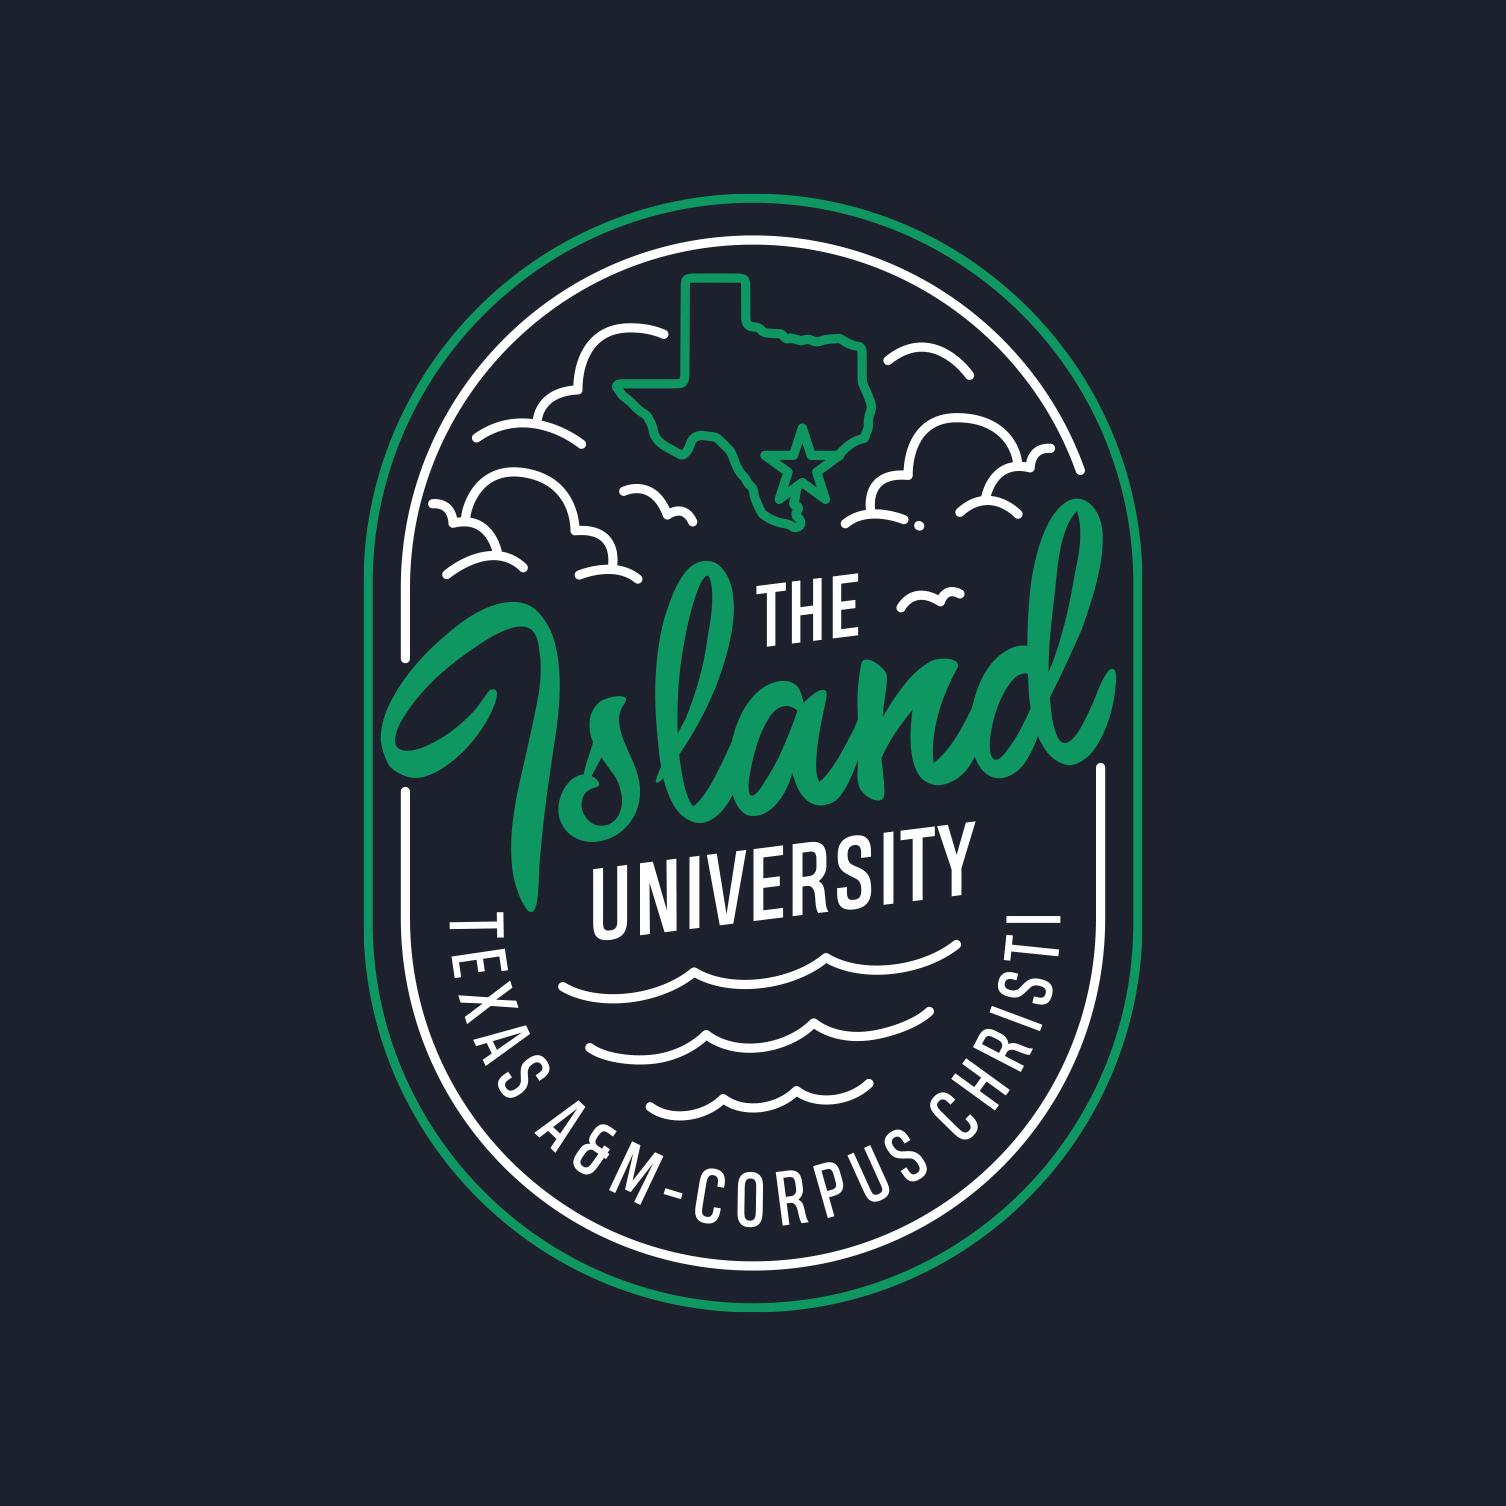 The Island University